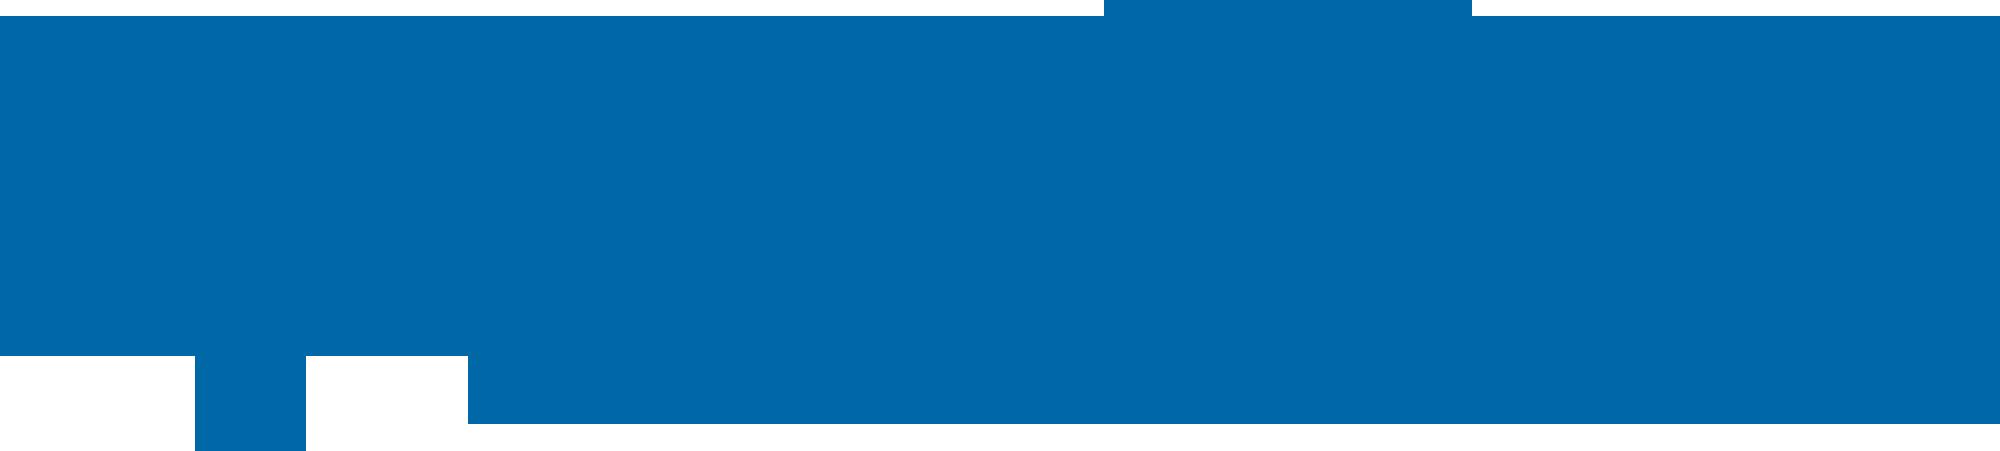 https://prestoninternational.com/wp-content/uploads/2018/06/f0198f34-68f4-45ea-8975-bcc2f6841aecVelan-logo.png